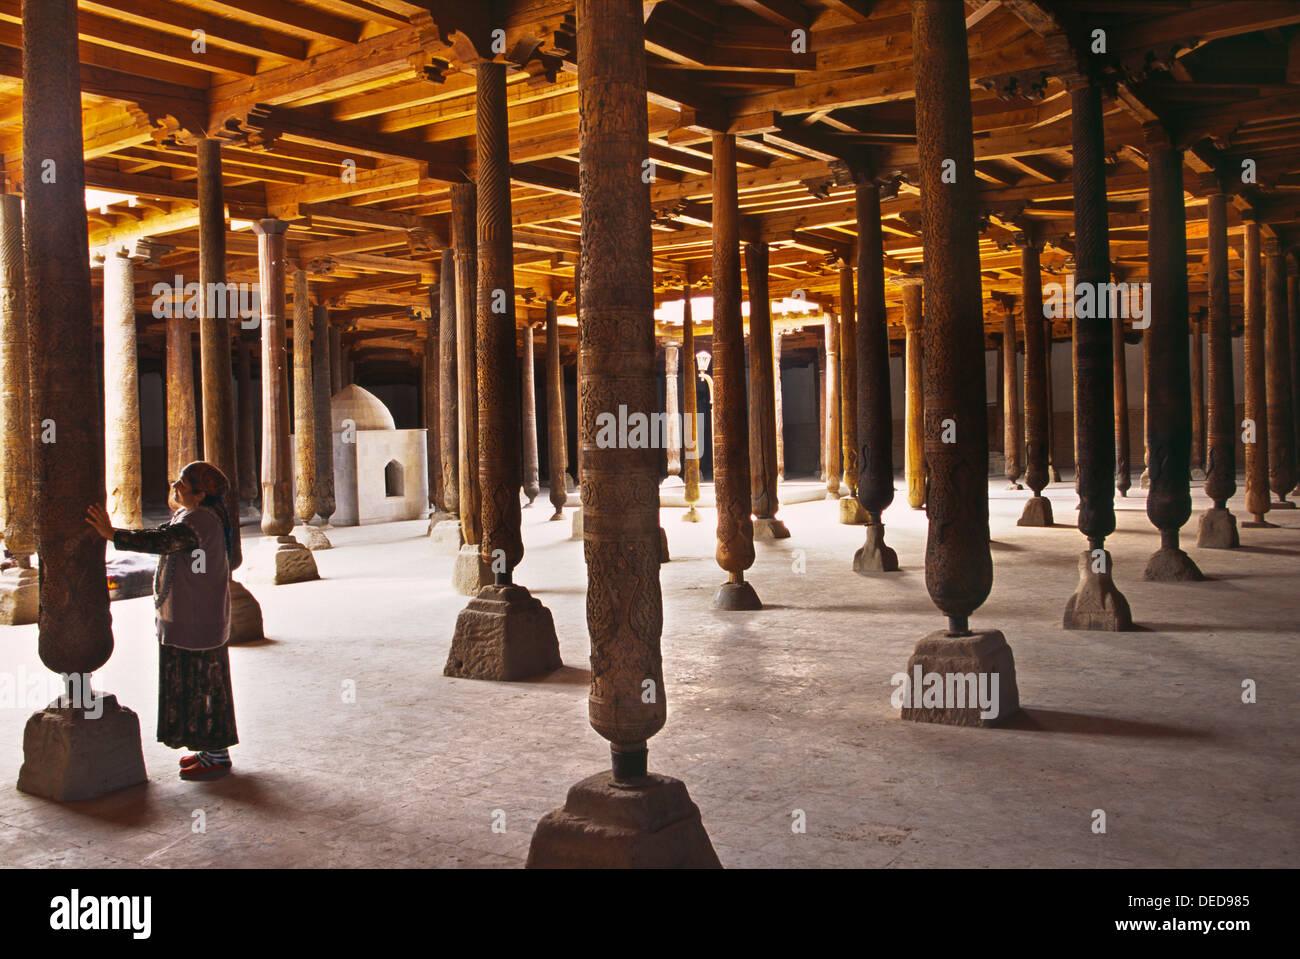 Wooden Columns Inside Of The Juma Mosque Khiva Silk Road Unesco World Heritage Site Uzbekistan Central Asia